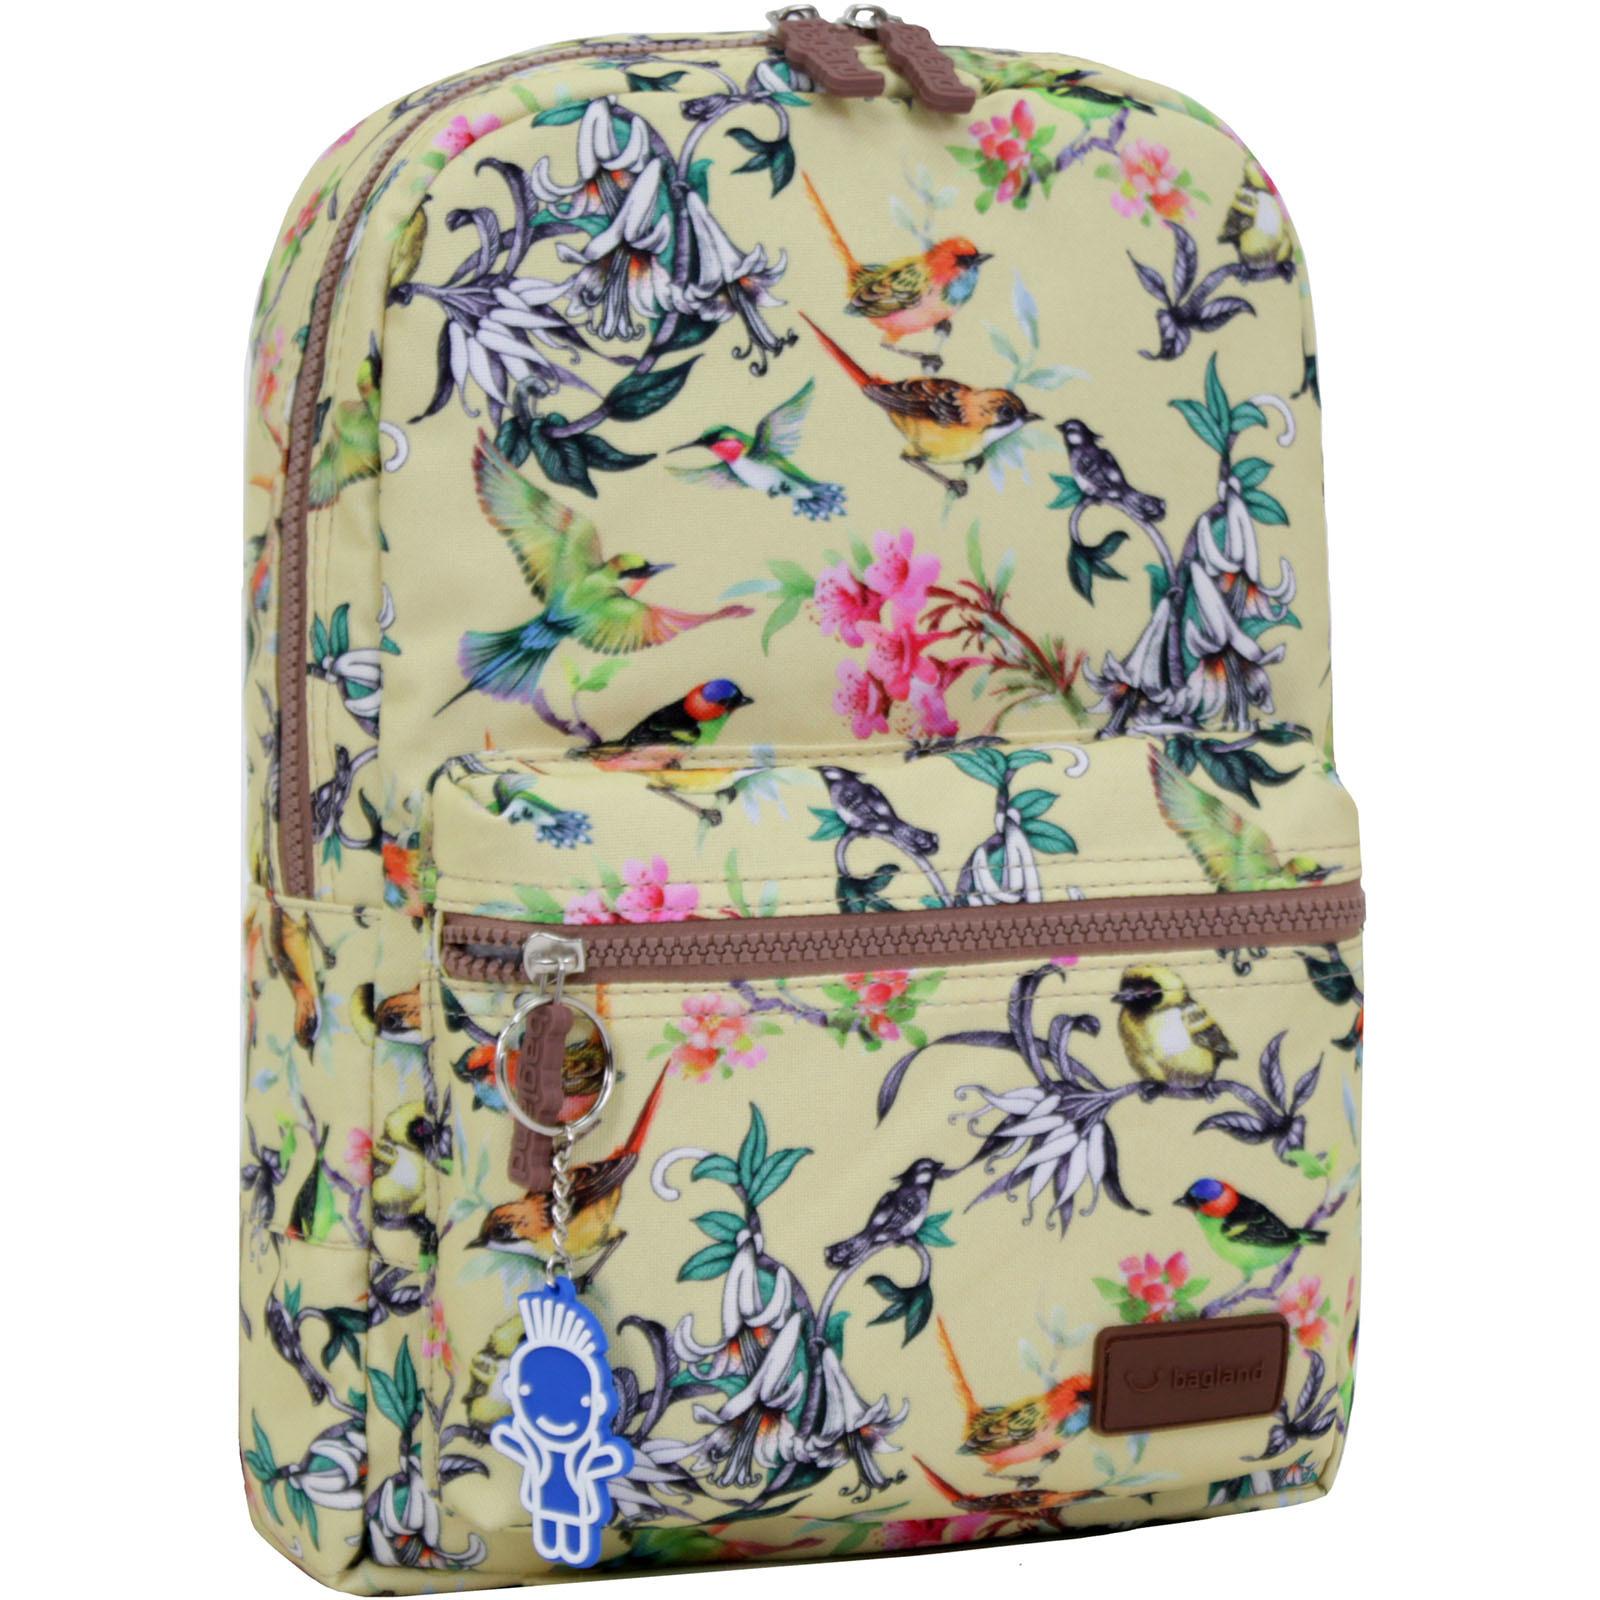 Молодежные рюкзаки Рюкзак Bagland Молодежный mini 8 л. сублимация 174 (00508664) IMG_0330_арт.174_.JPG